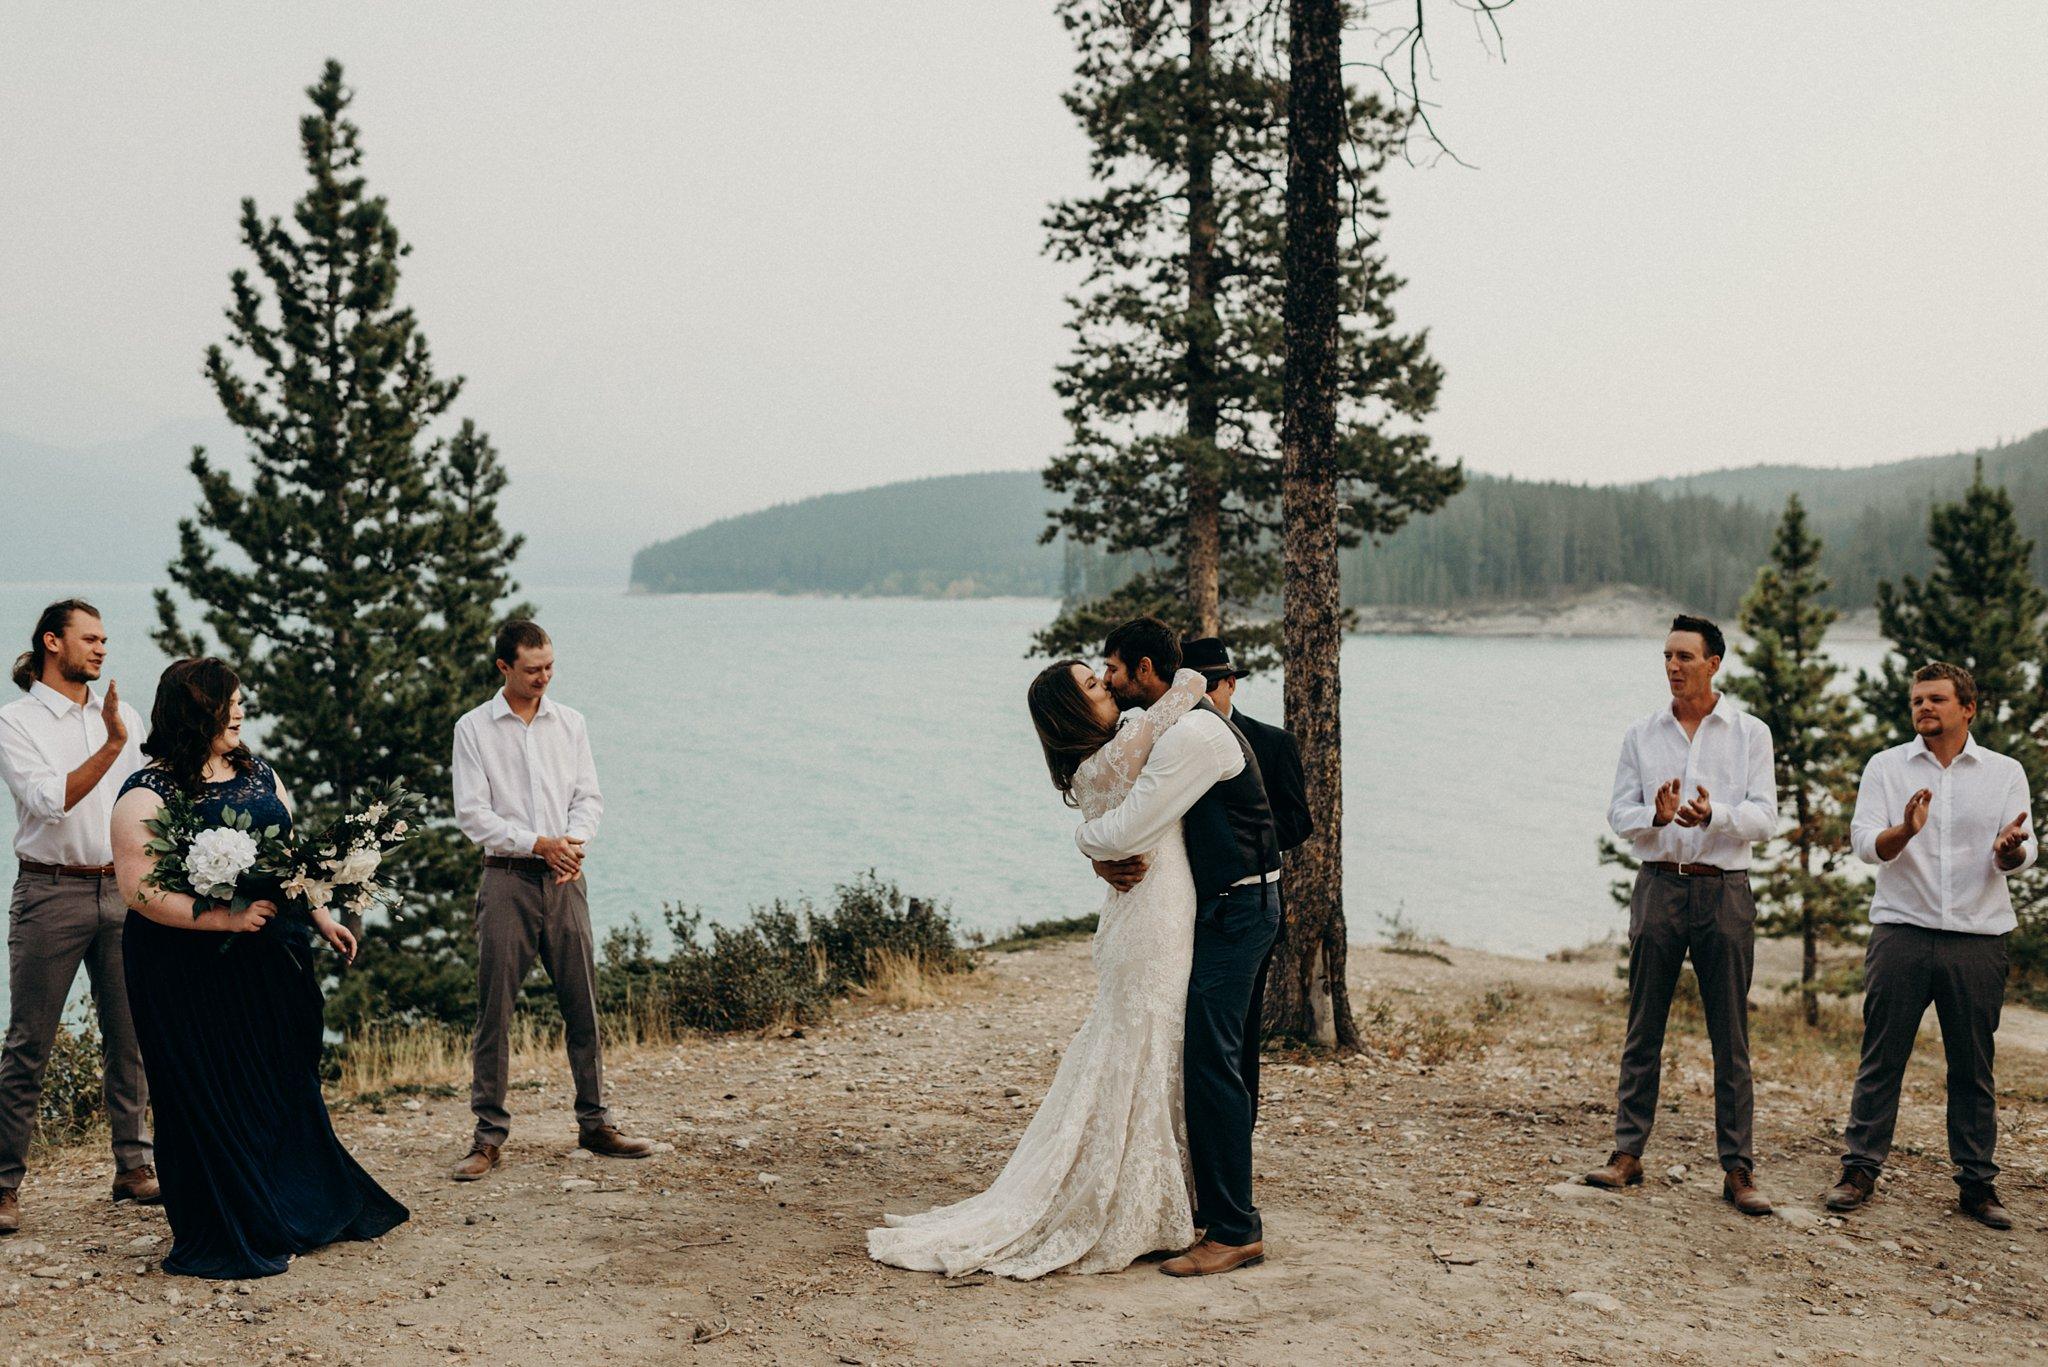 kaihla_tonai_intimate_wedding_elopement_photographer_6727.jpg